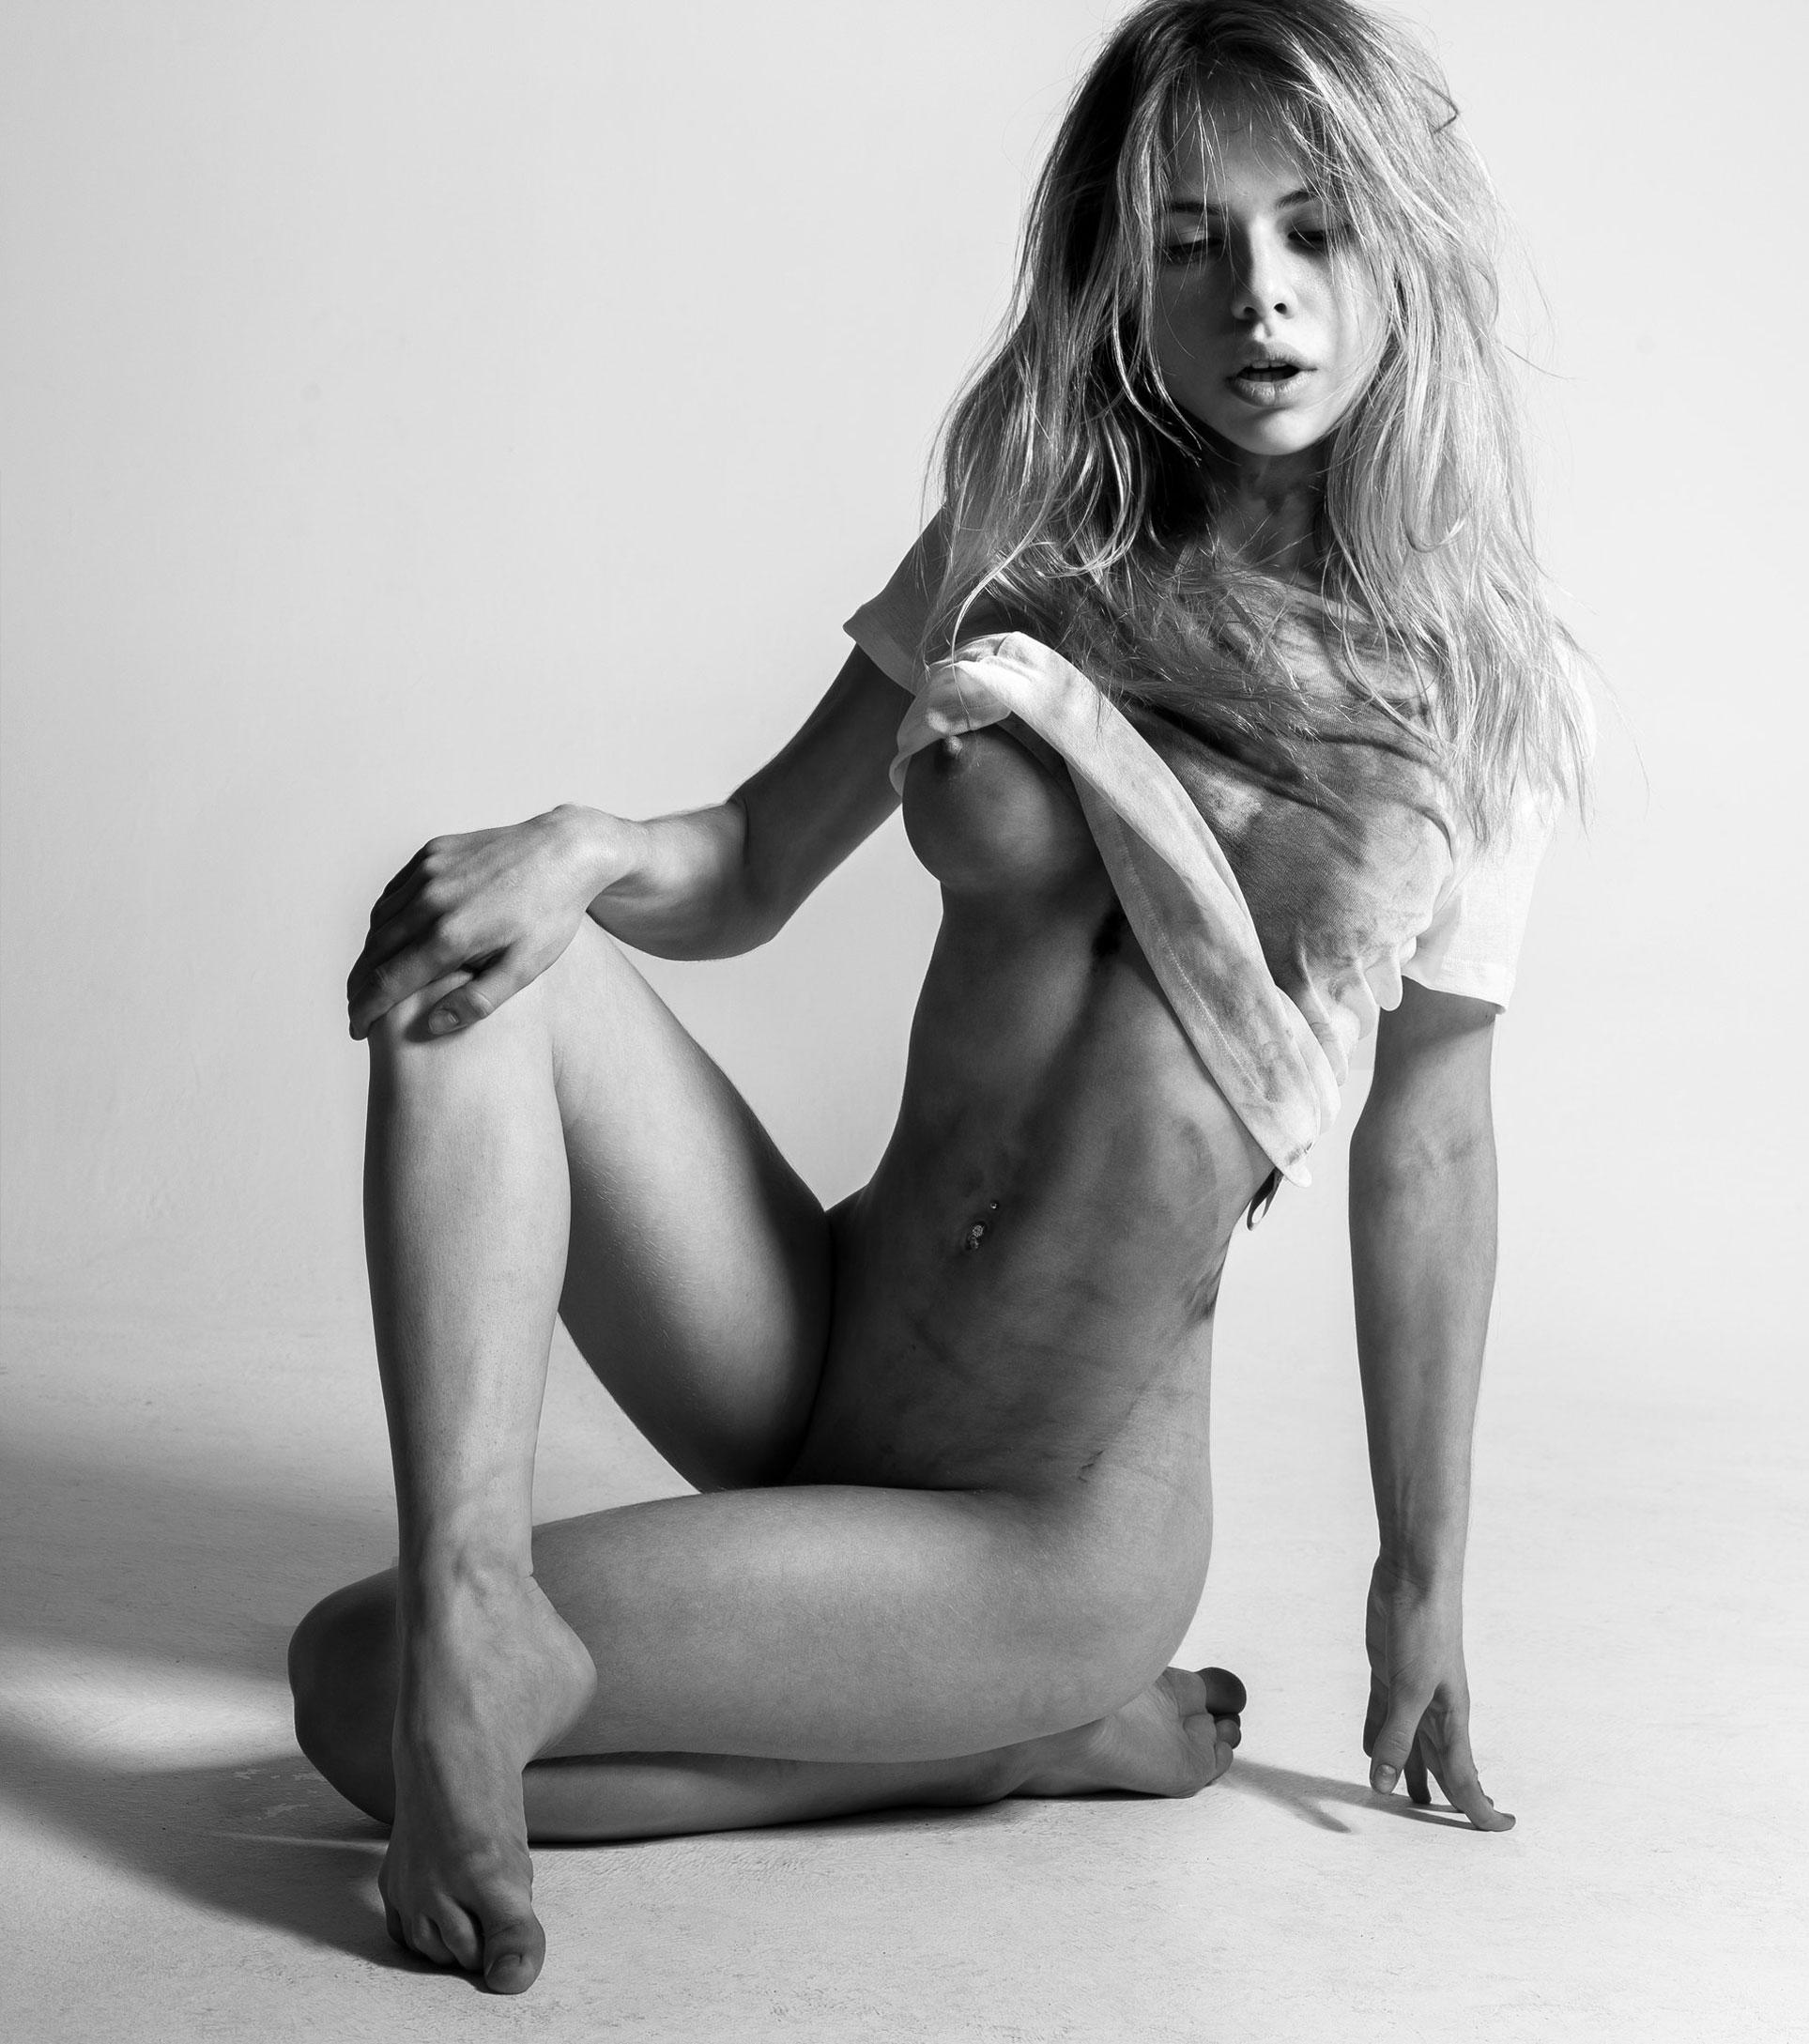 Александра Смелова / Alexandra Smelova nude by Alex Izumov